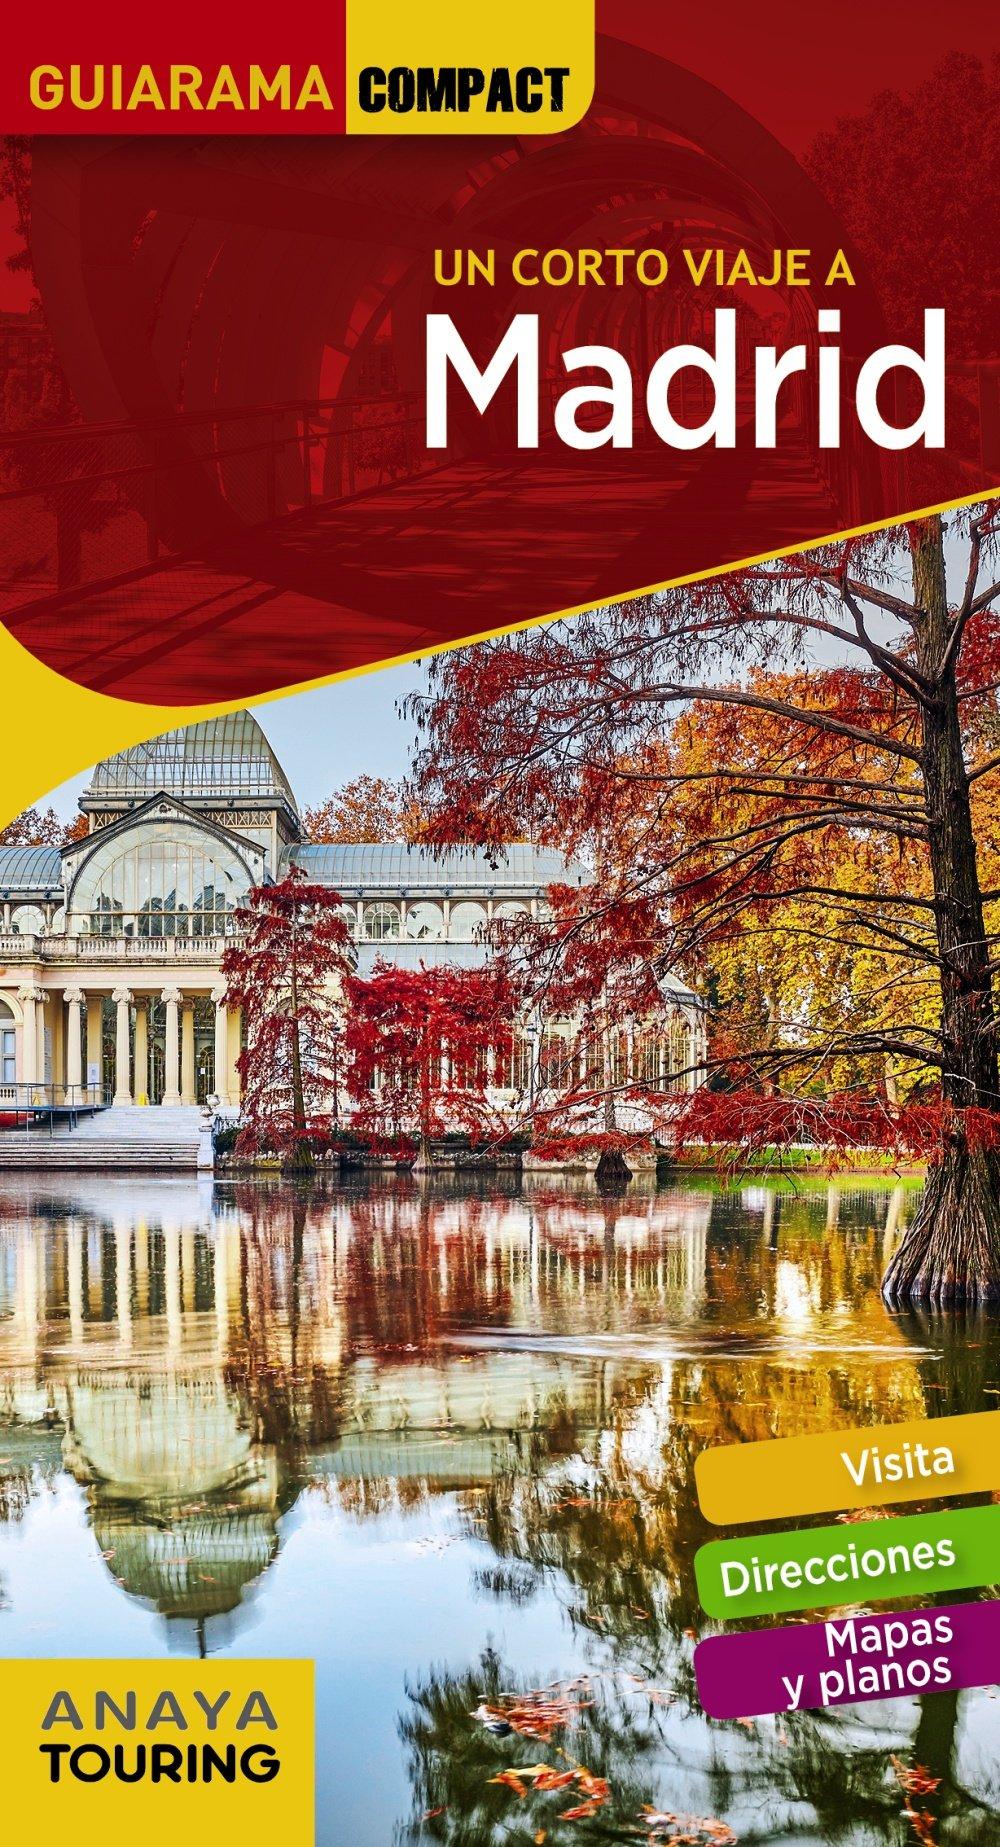 Madrid (GUIARAMA COMPACT - España): Amazon.es: Anaya Touring, Martínez Reverte, Javier, Giles Pacheco, Fernando de, Roba, Silvia, Paz Saz, Pepo: Libros